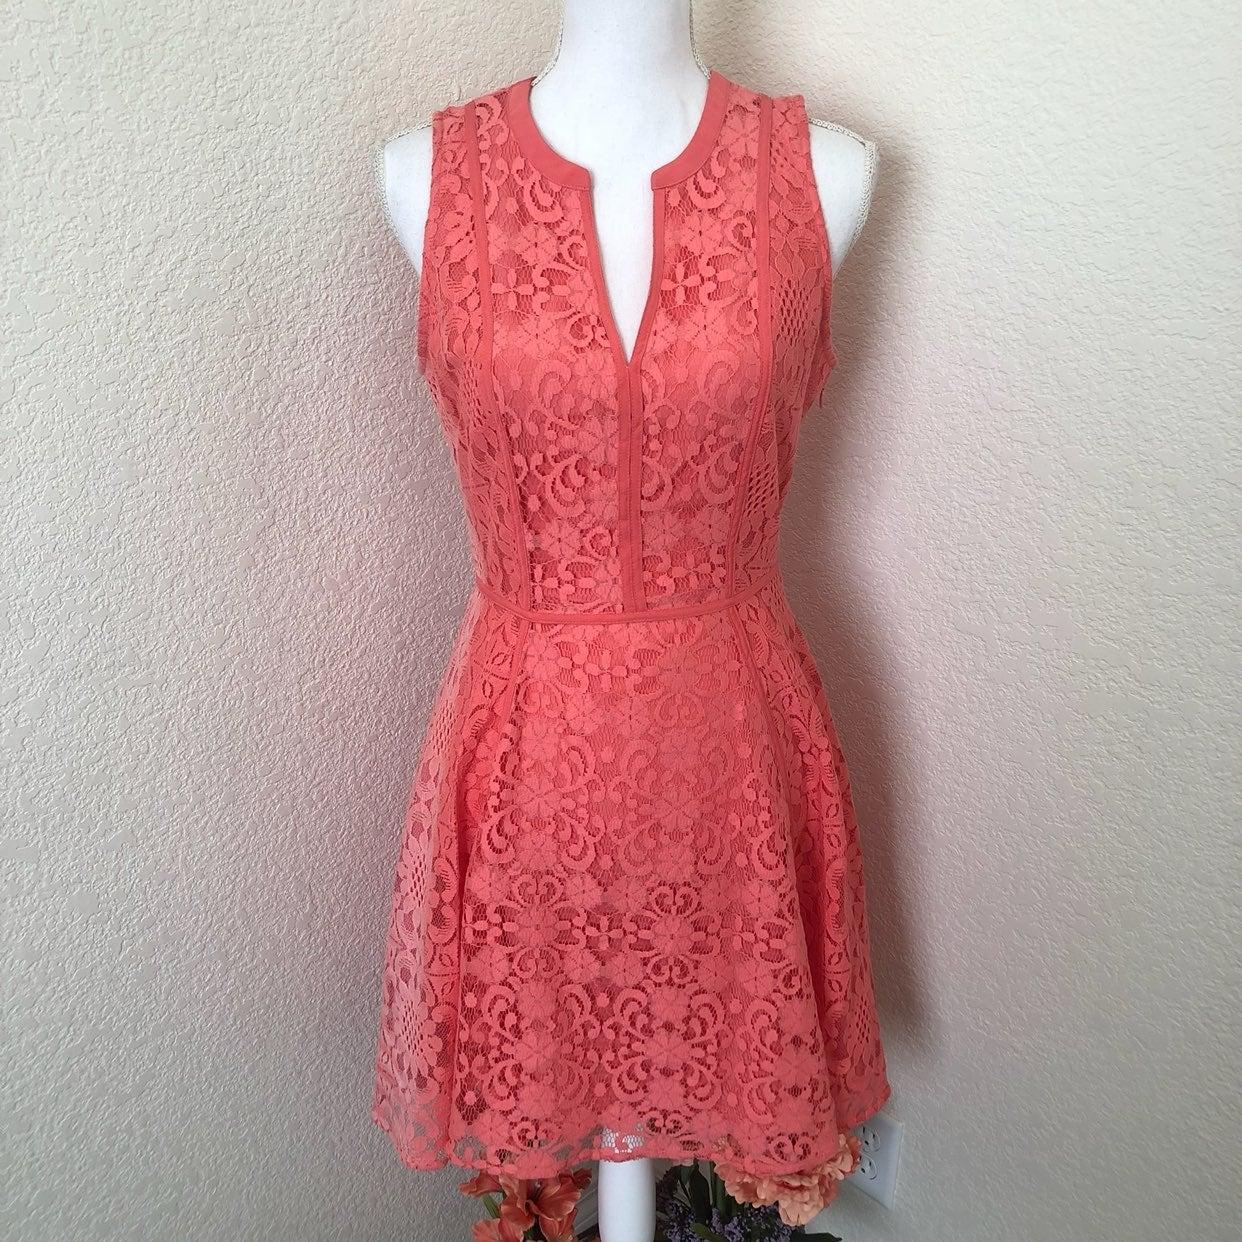 LC Lauren Conrad Coral Lace Dress 8